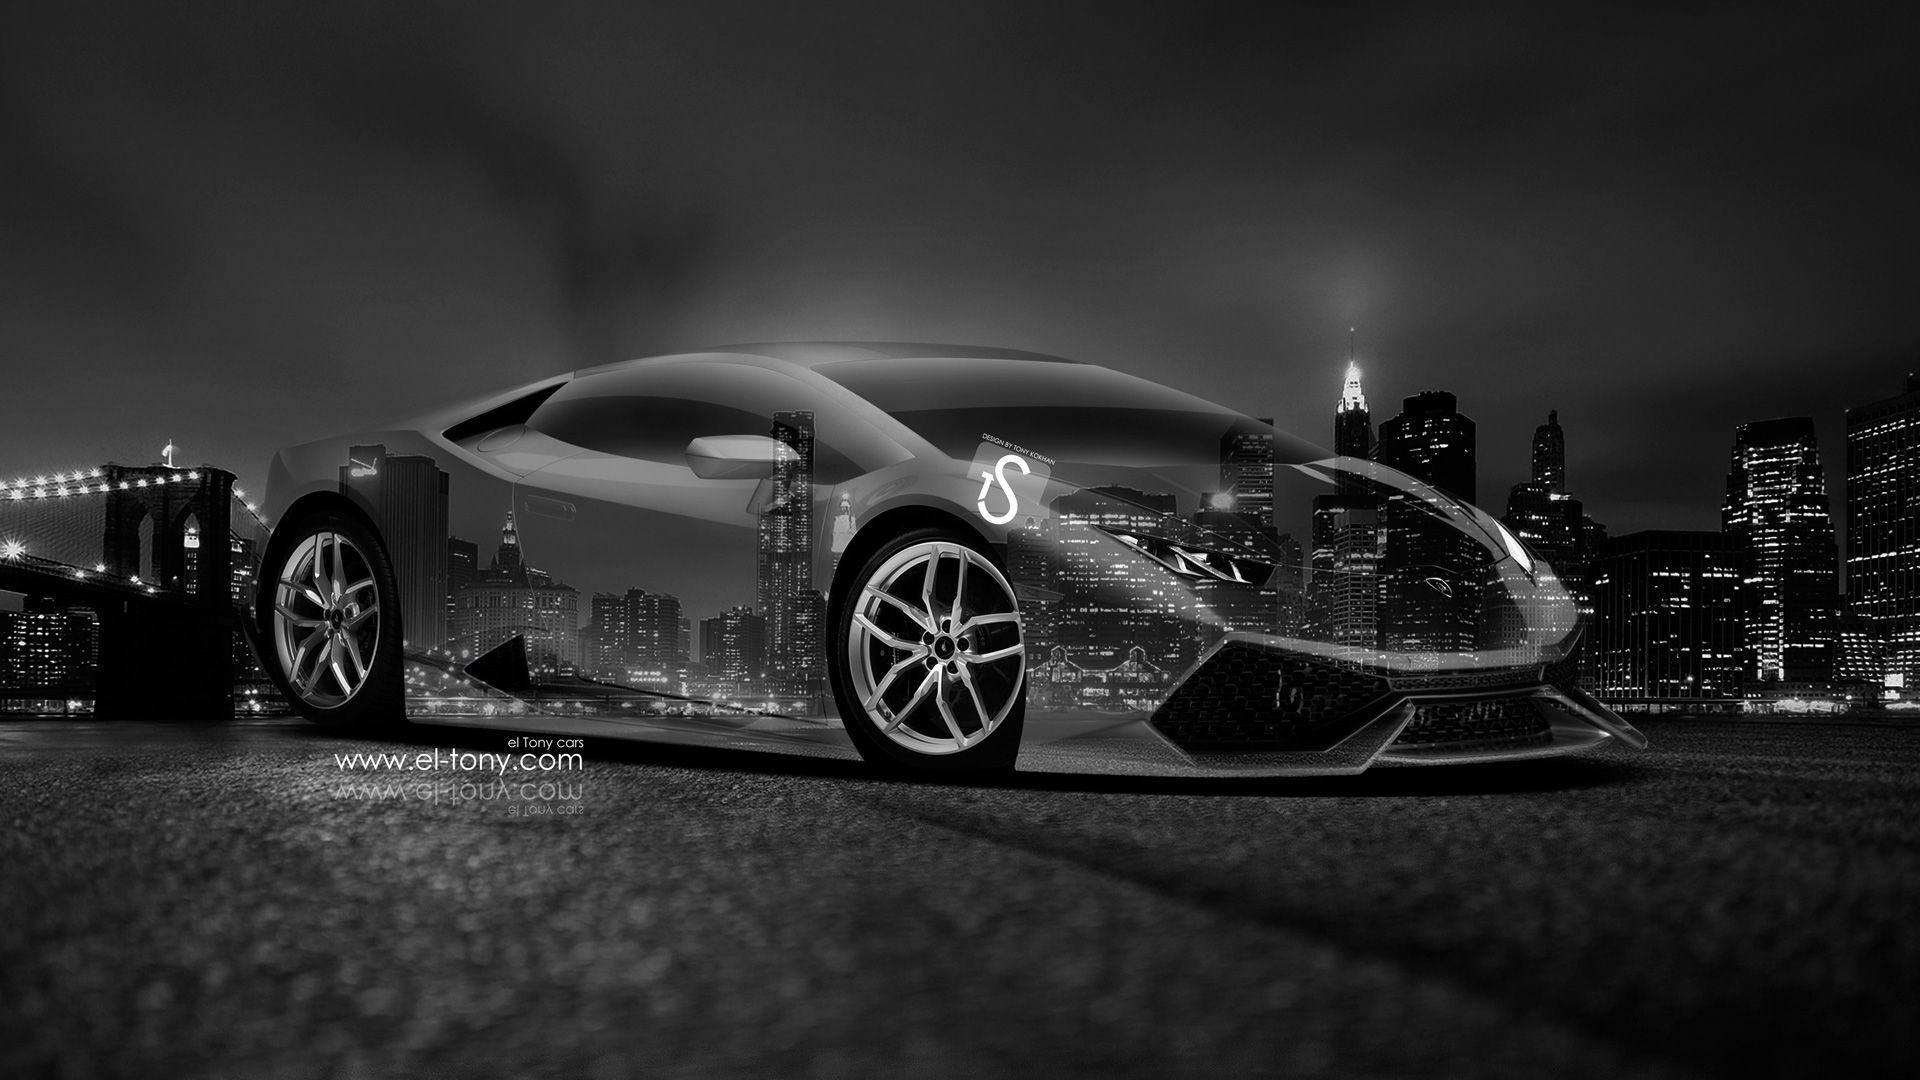 eb3020d11b07c2ce2053e49e9486fa2a Exciting Lamborghini Huracán Lp 610-4 Cena Cars Trend